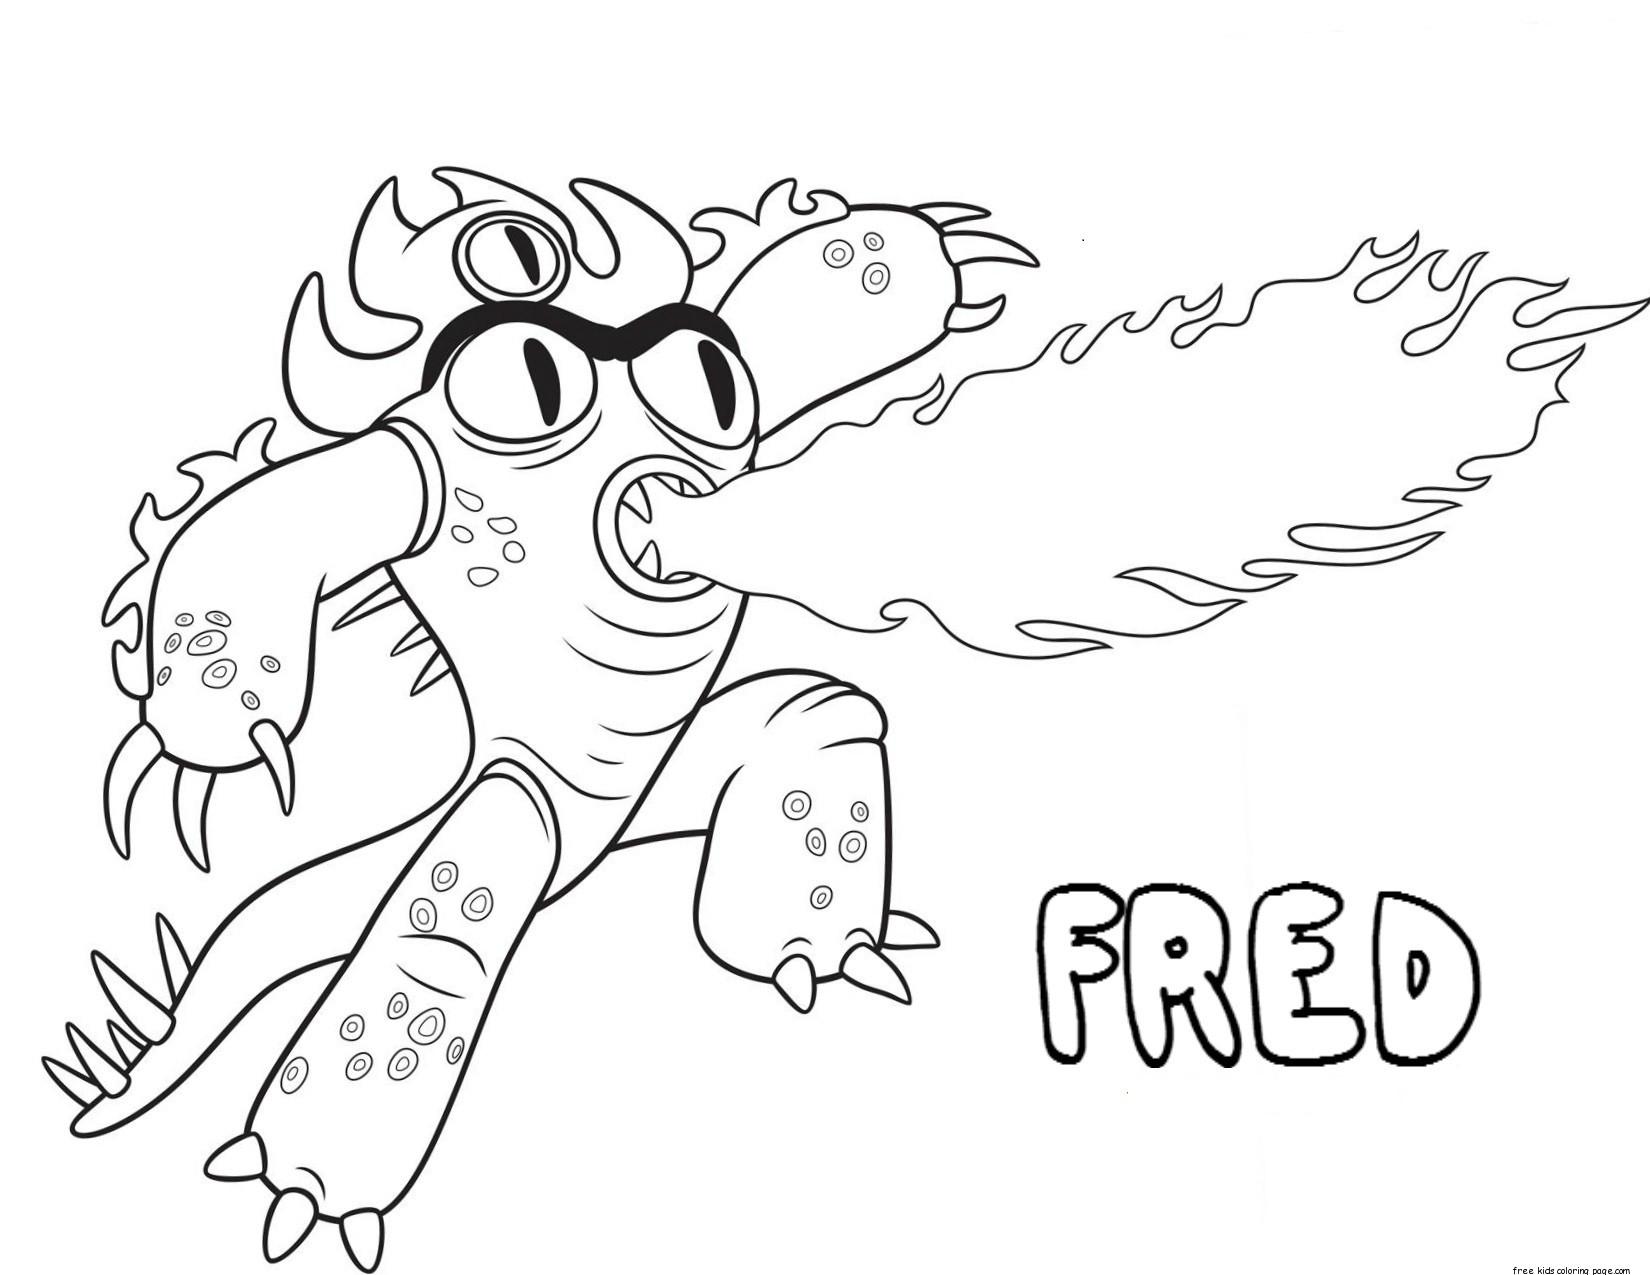 Printable Big Hero 6 Coloring Pages Fred For Kidsfree Printable